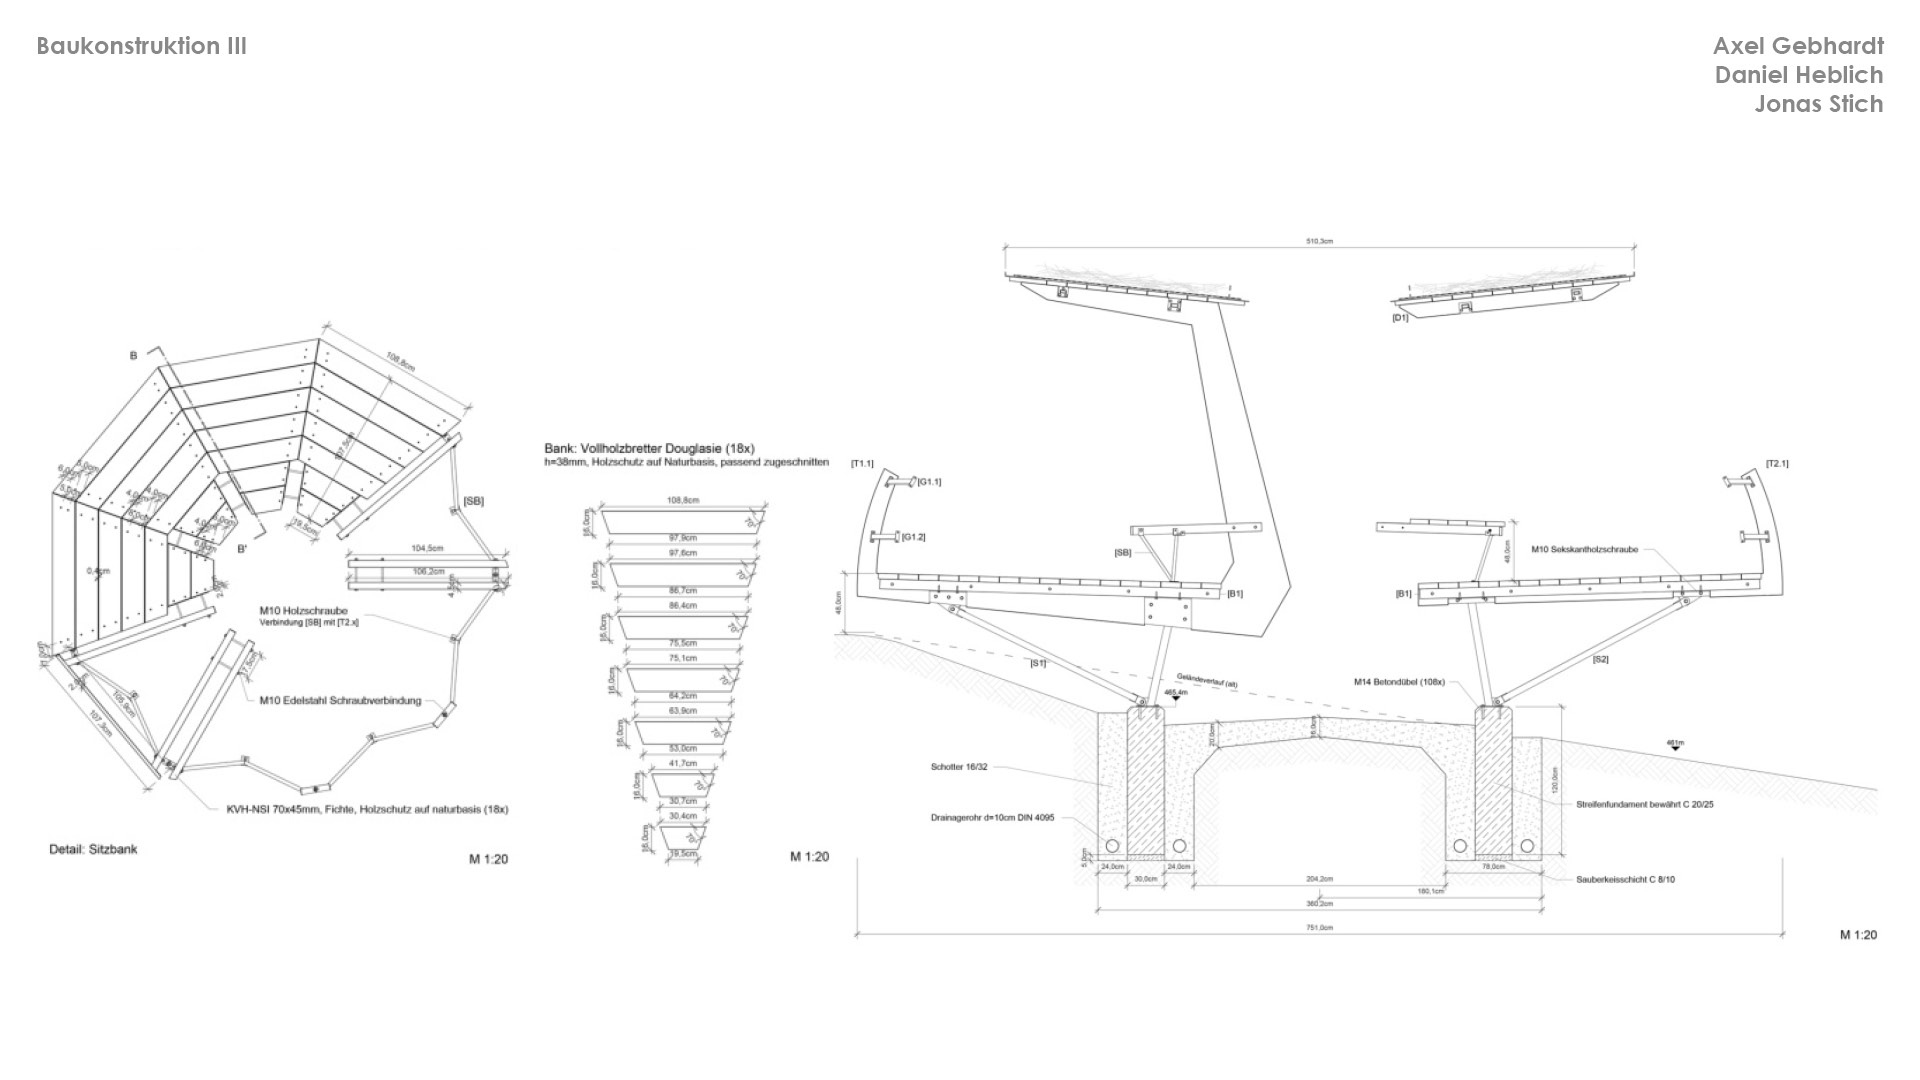 02 2013 3 BaukonstruktionIII